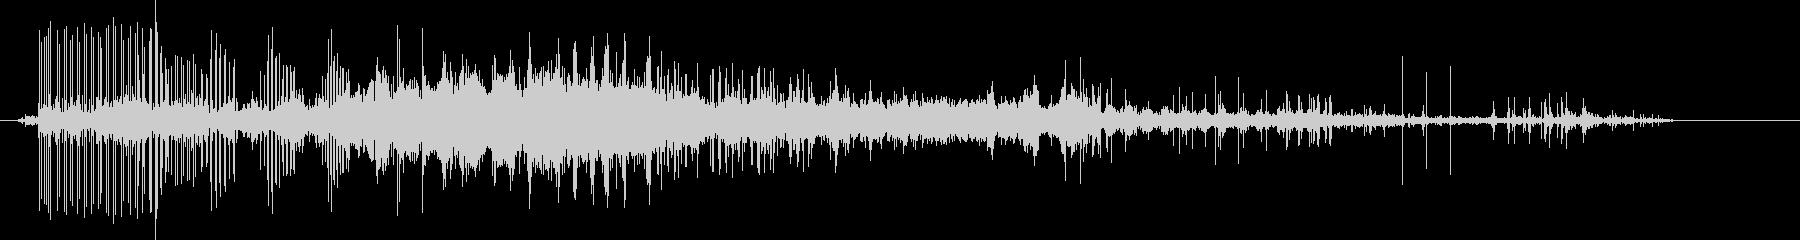 CINEMATIC BEEP 07の未再生の波形